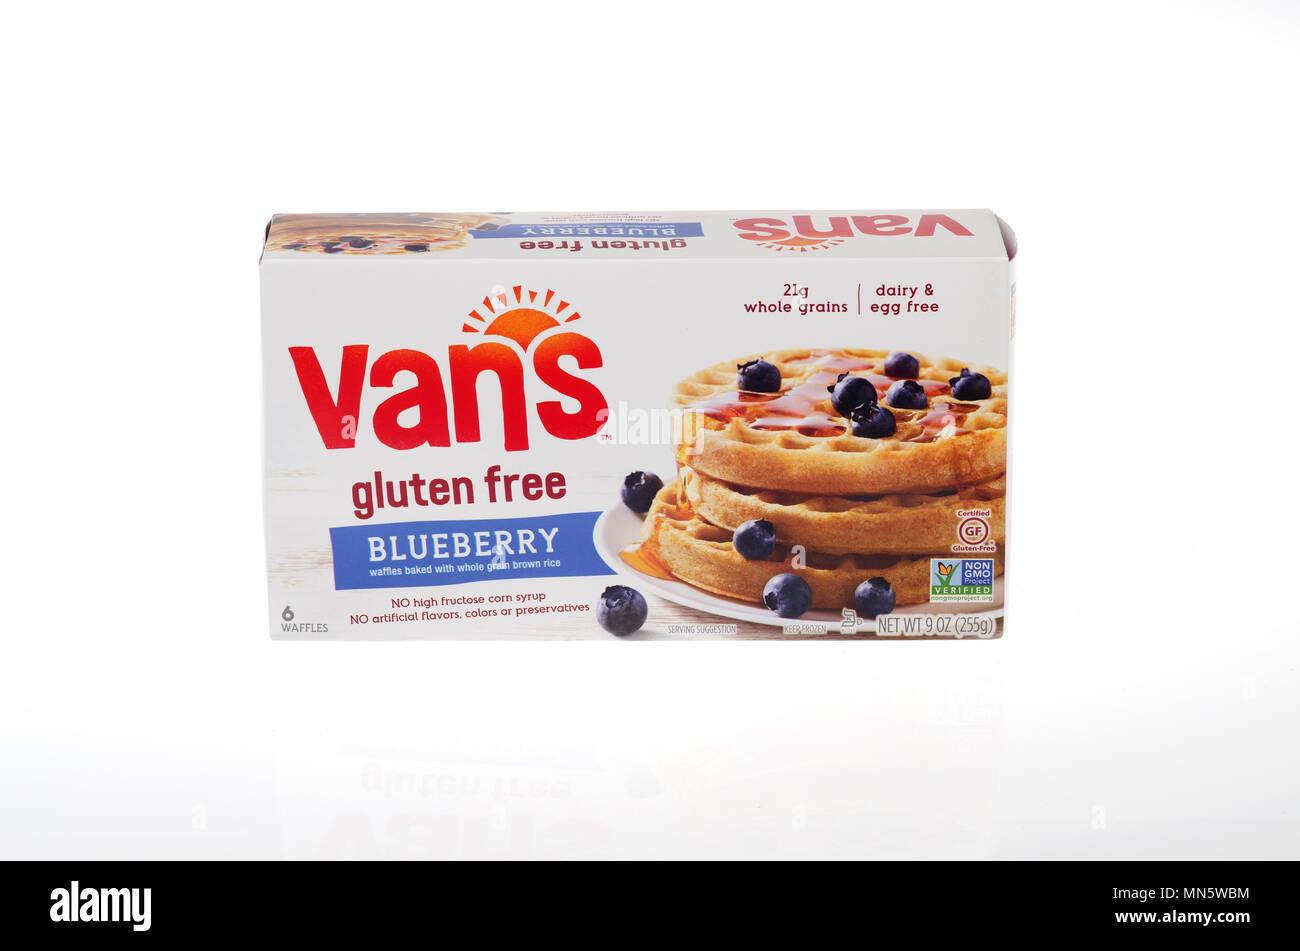 Box of Vans Gluten Free Frozen Blueberry Waffles - Stock Image